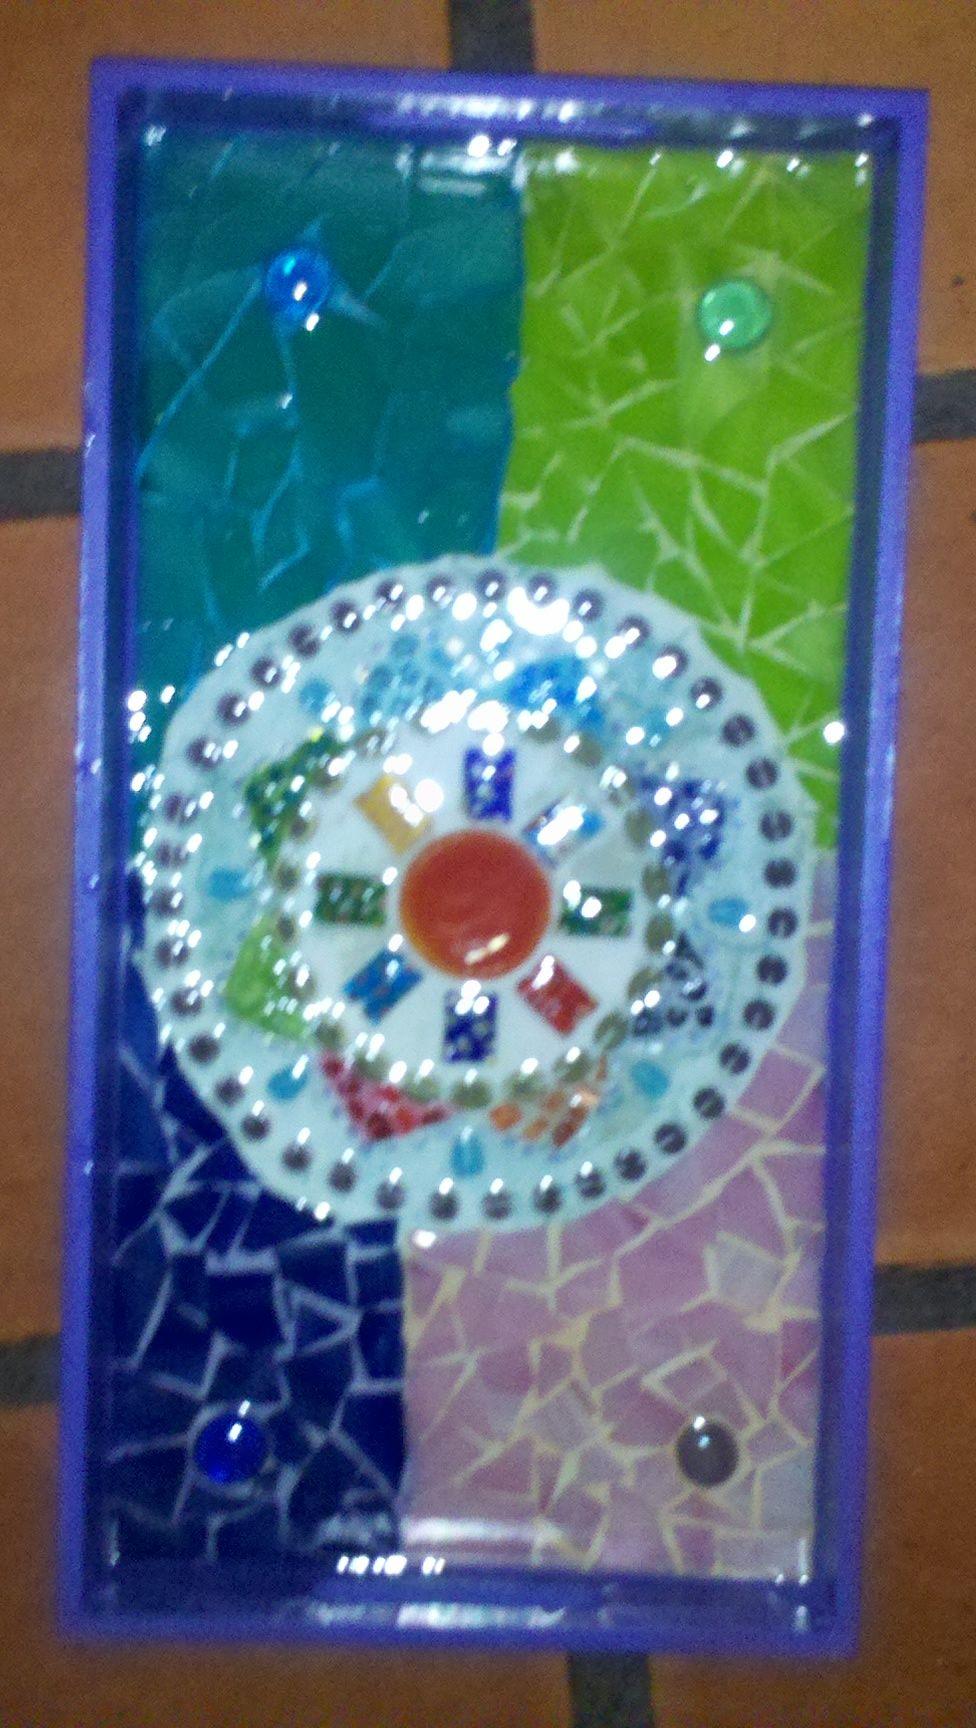 Bandeja rectangular mediana con mandala de vidrios